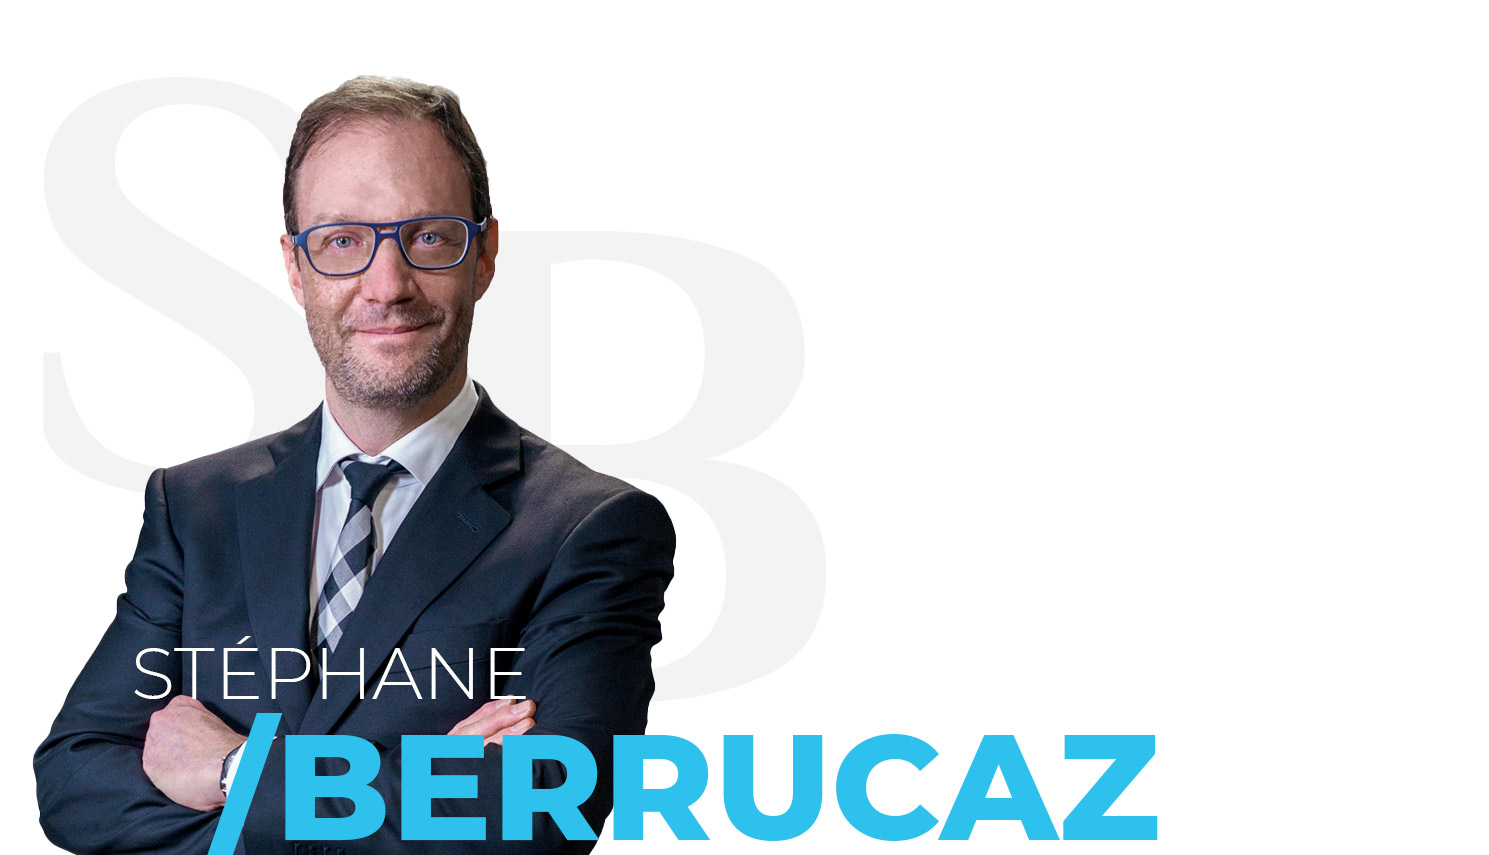 Stéphane BERRUCAZ